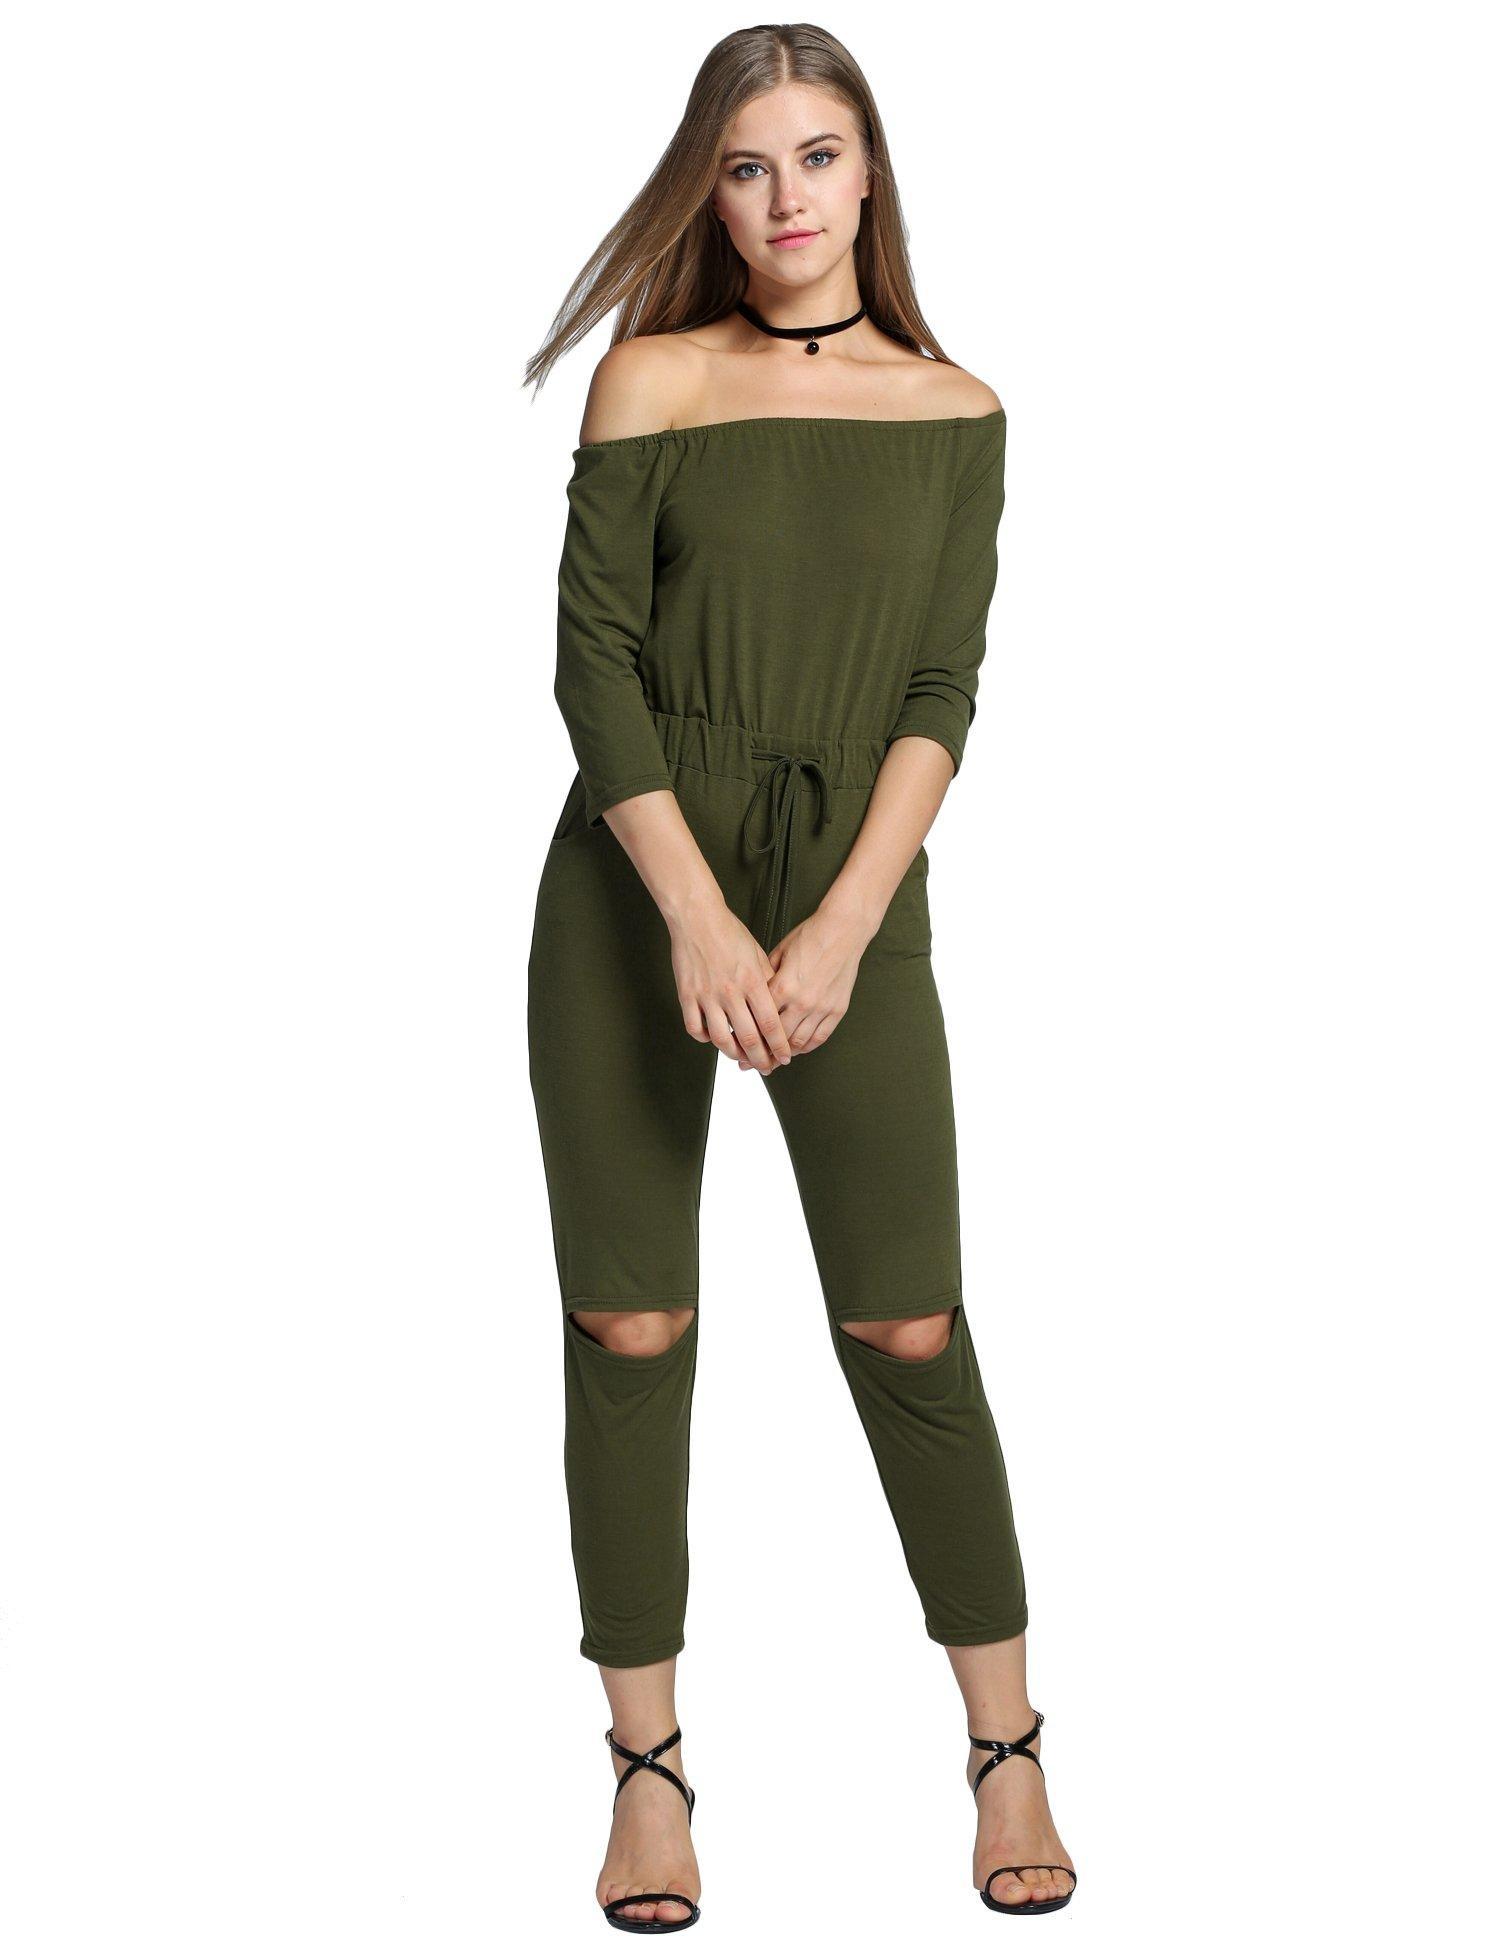 014ecbdb613 Online Store  Kize Women Long Sleeve Sexy Clubwear Drawstring Jumpsuit  Rompers Plus Size